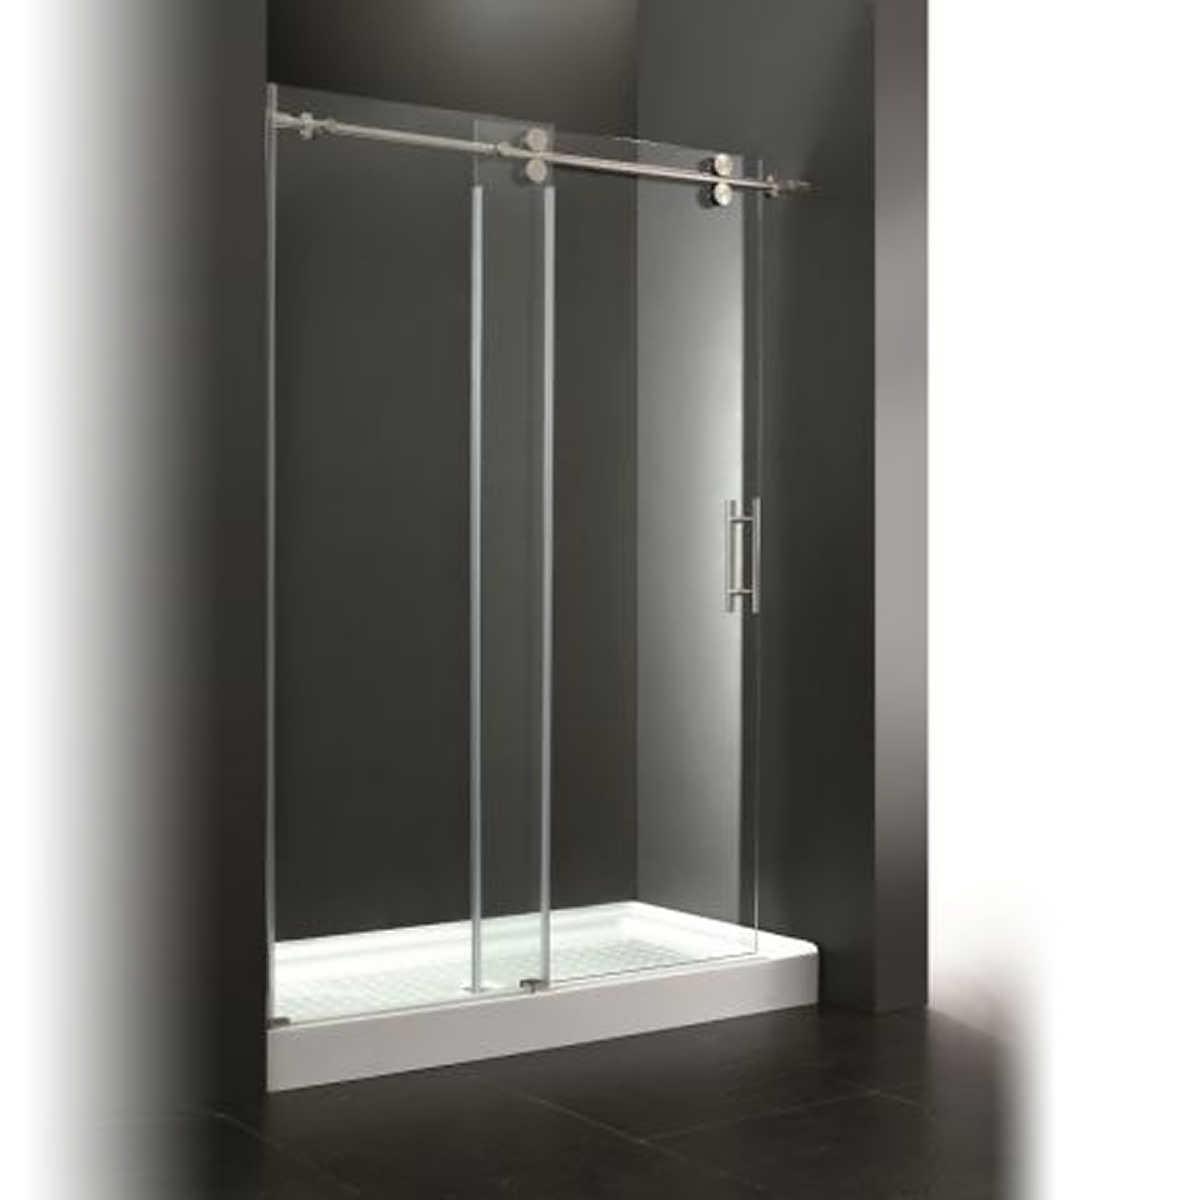 Ove Decors Shower Doors Ove Decors Orlando Shower